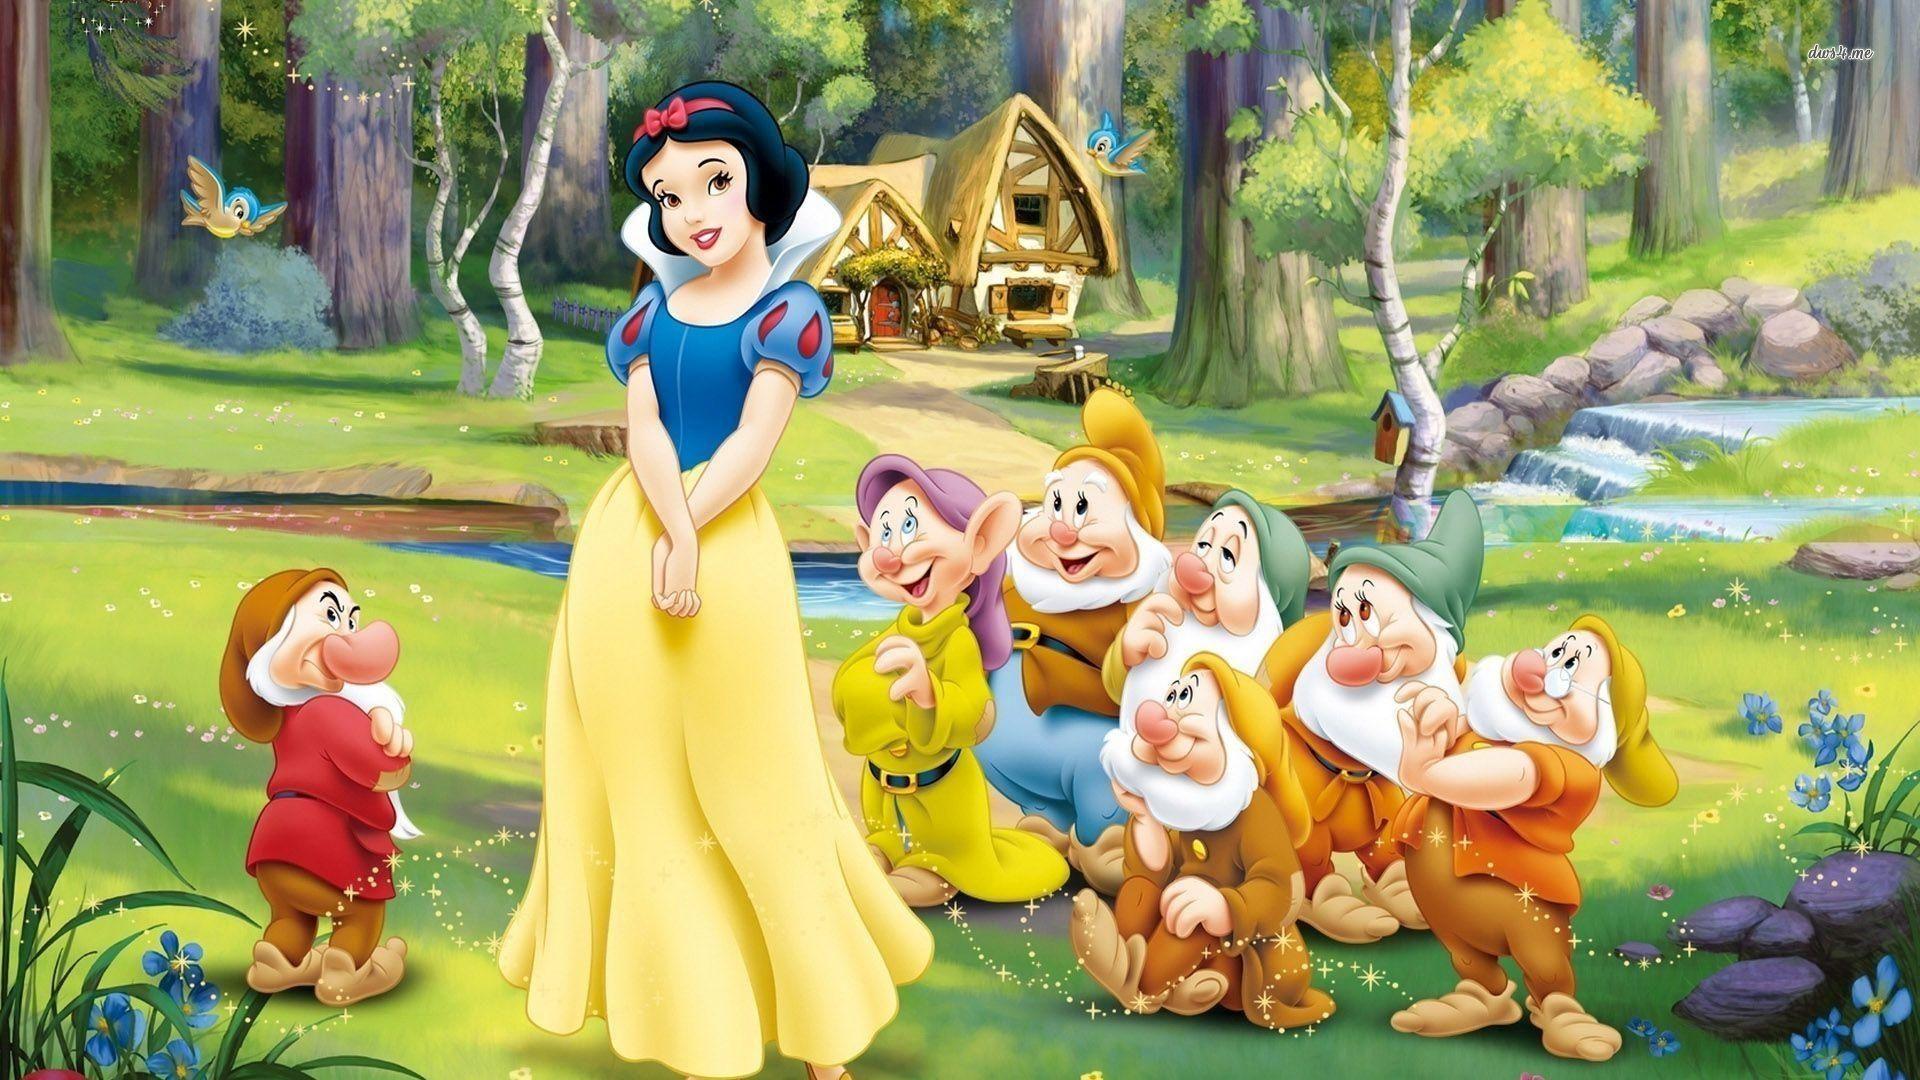 10 New Snow White And The Seven Dwarfs Wallpaper Full Hd 1920 1080 For Pc Desktop Snow White Snow White Seven Dwarfs Snow